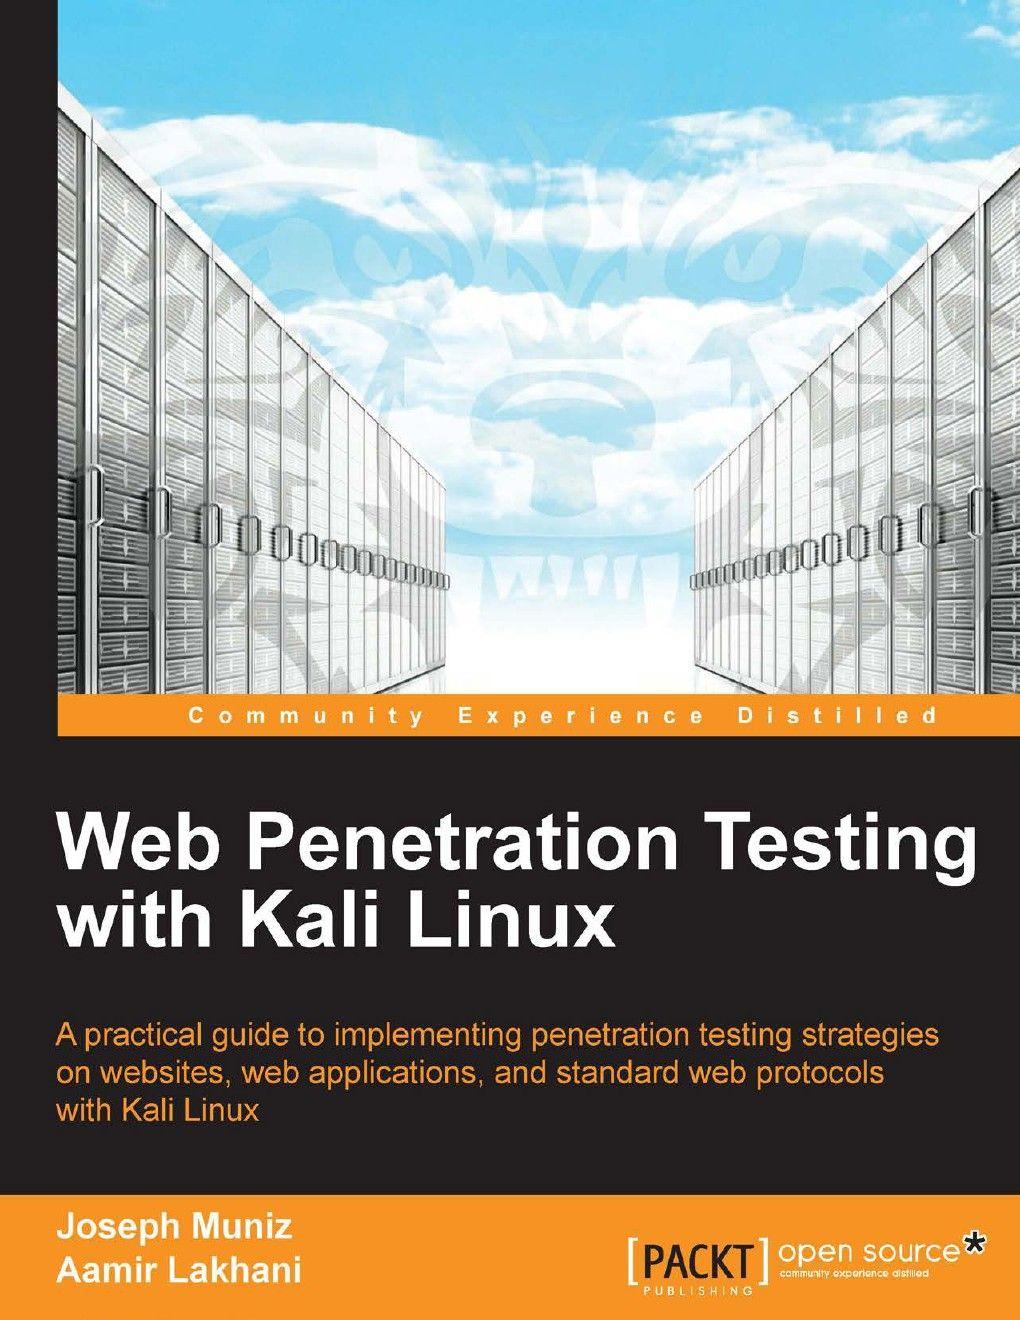 Download ebook web penetration testing with kali linux 2013 hacker